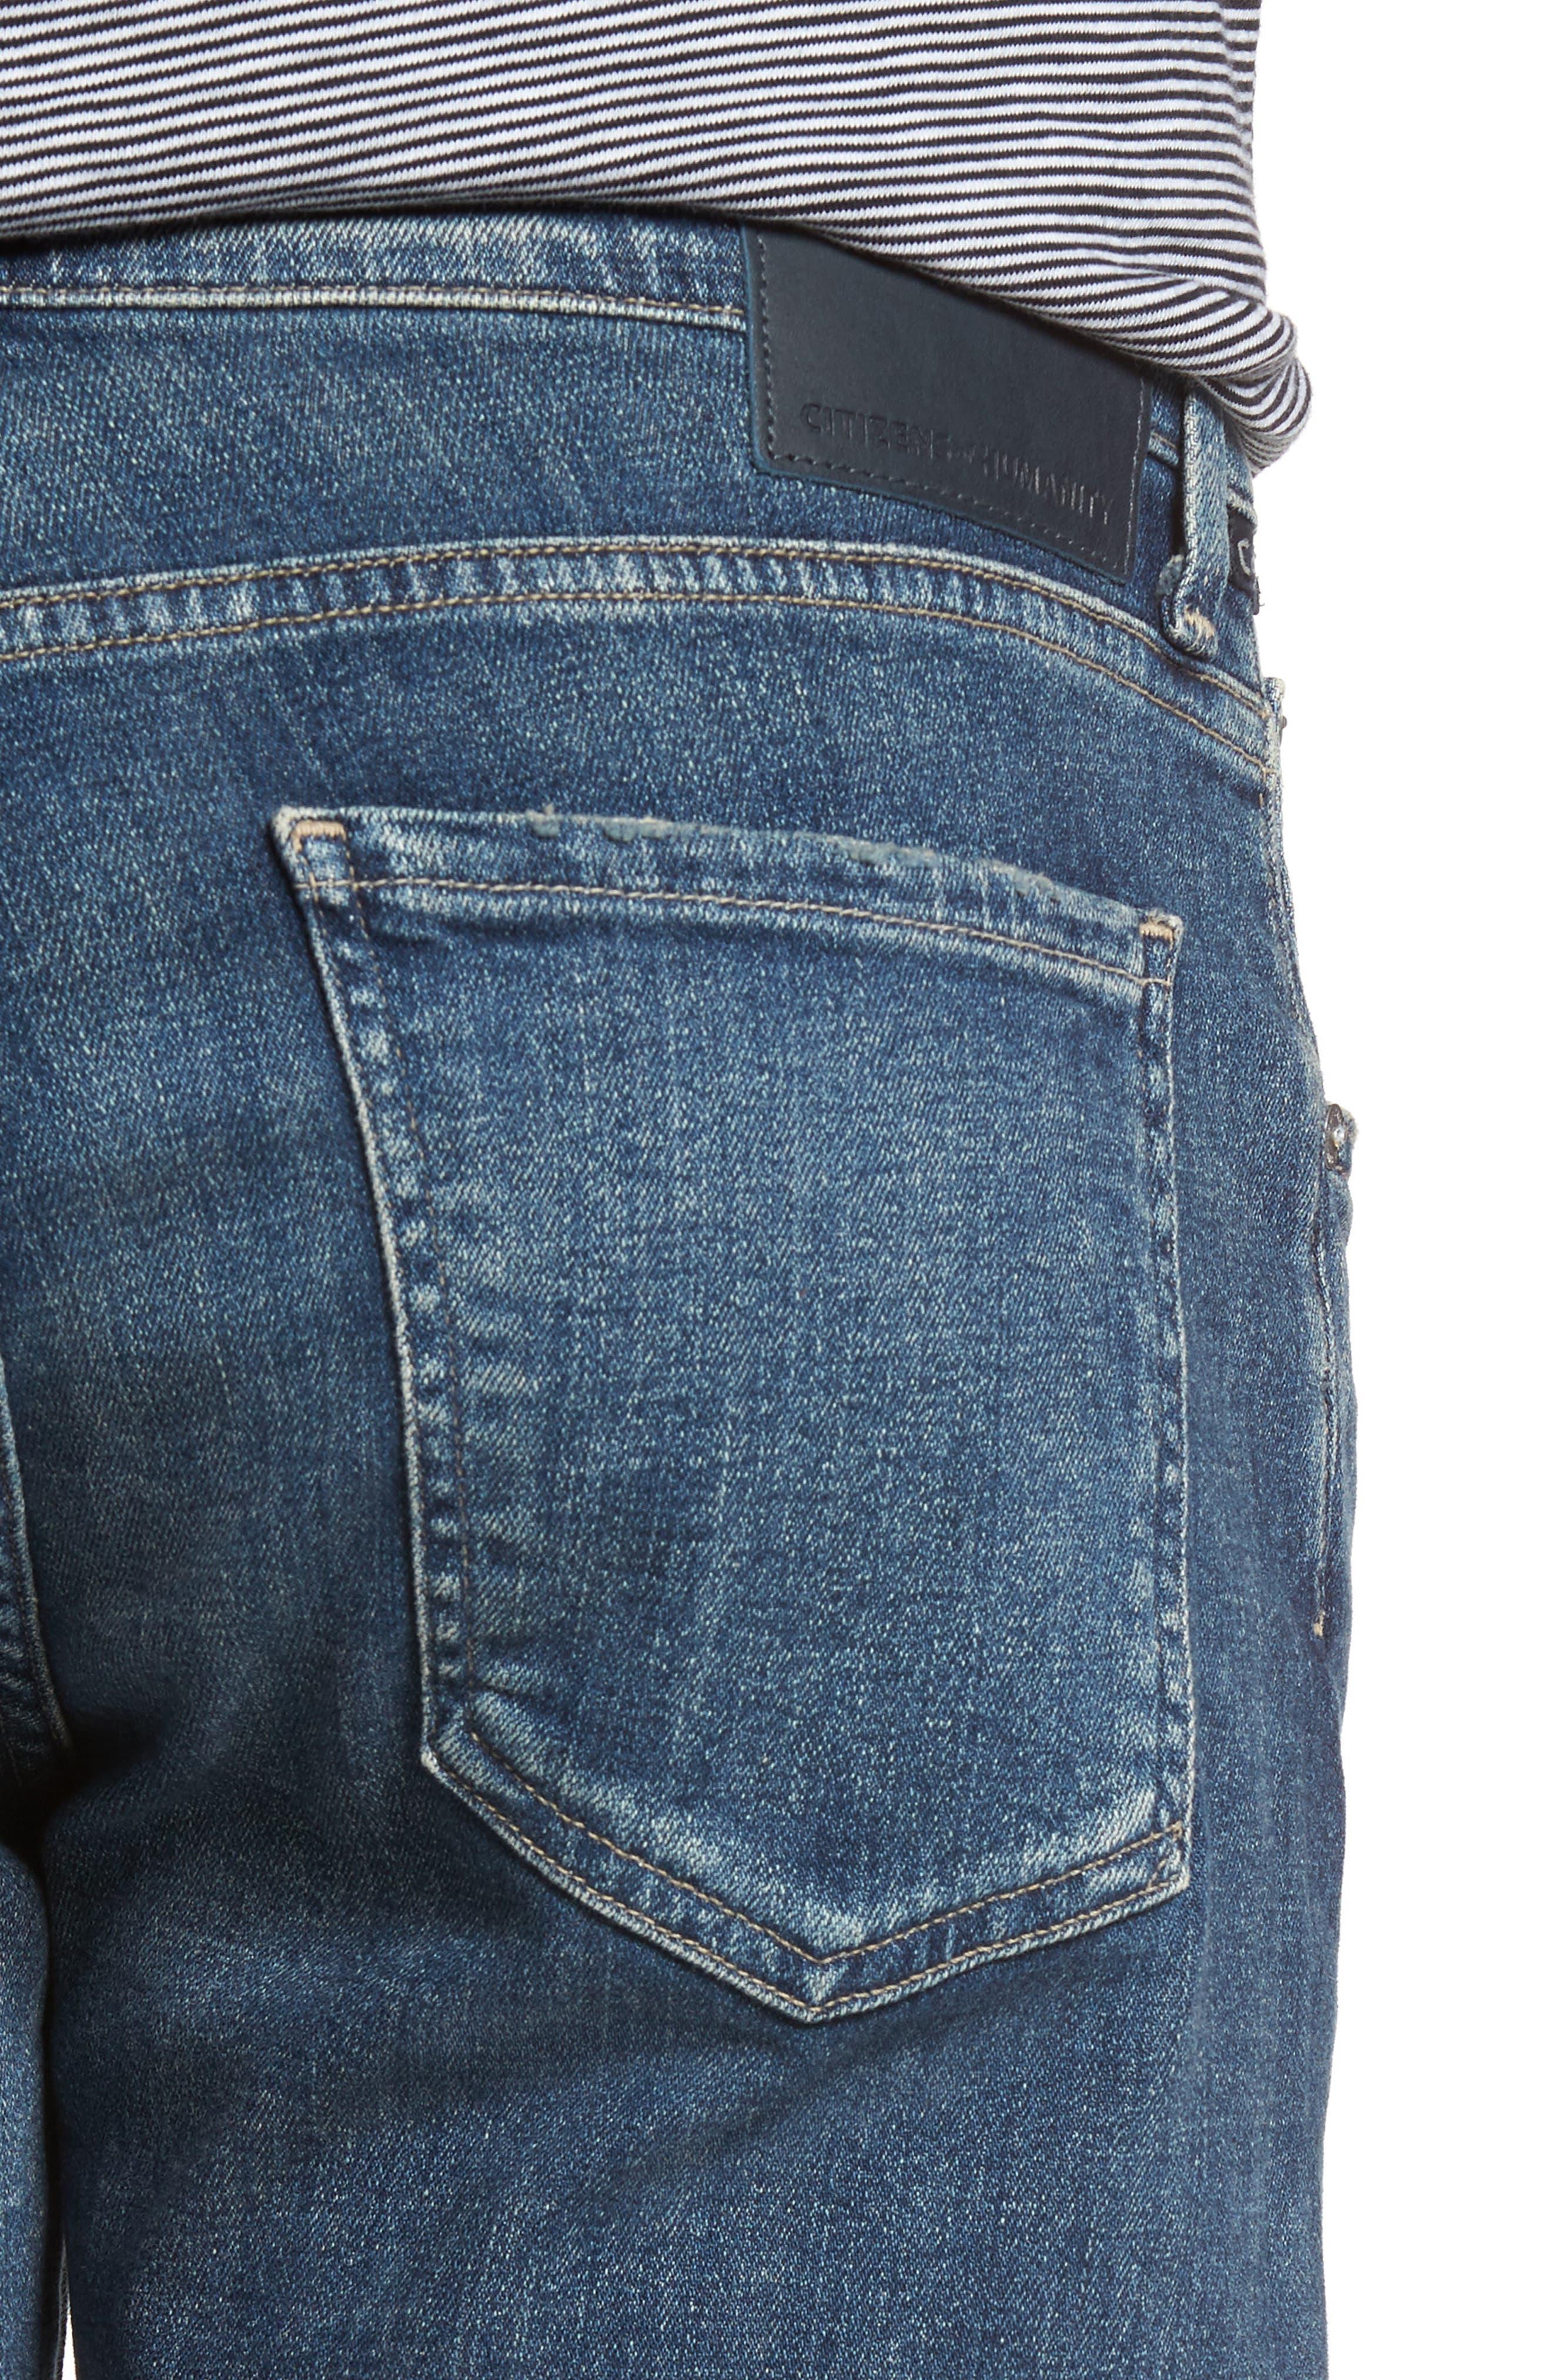 Gage Slim Straight Leg Jeans,                             Alternate thumbnail 4, color,                             REDFORD